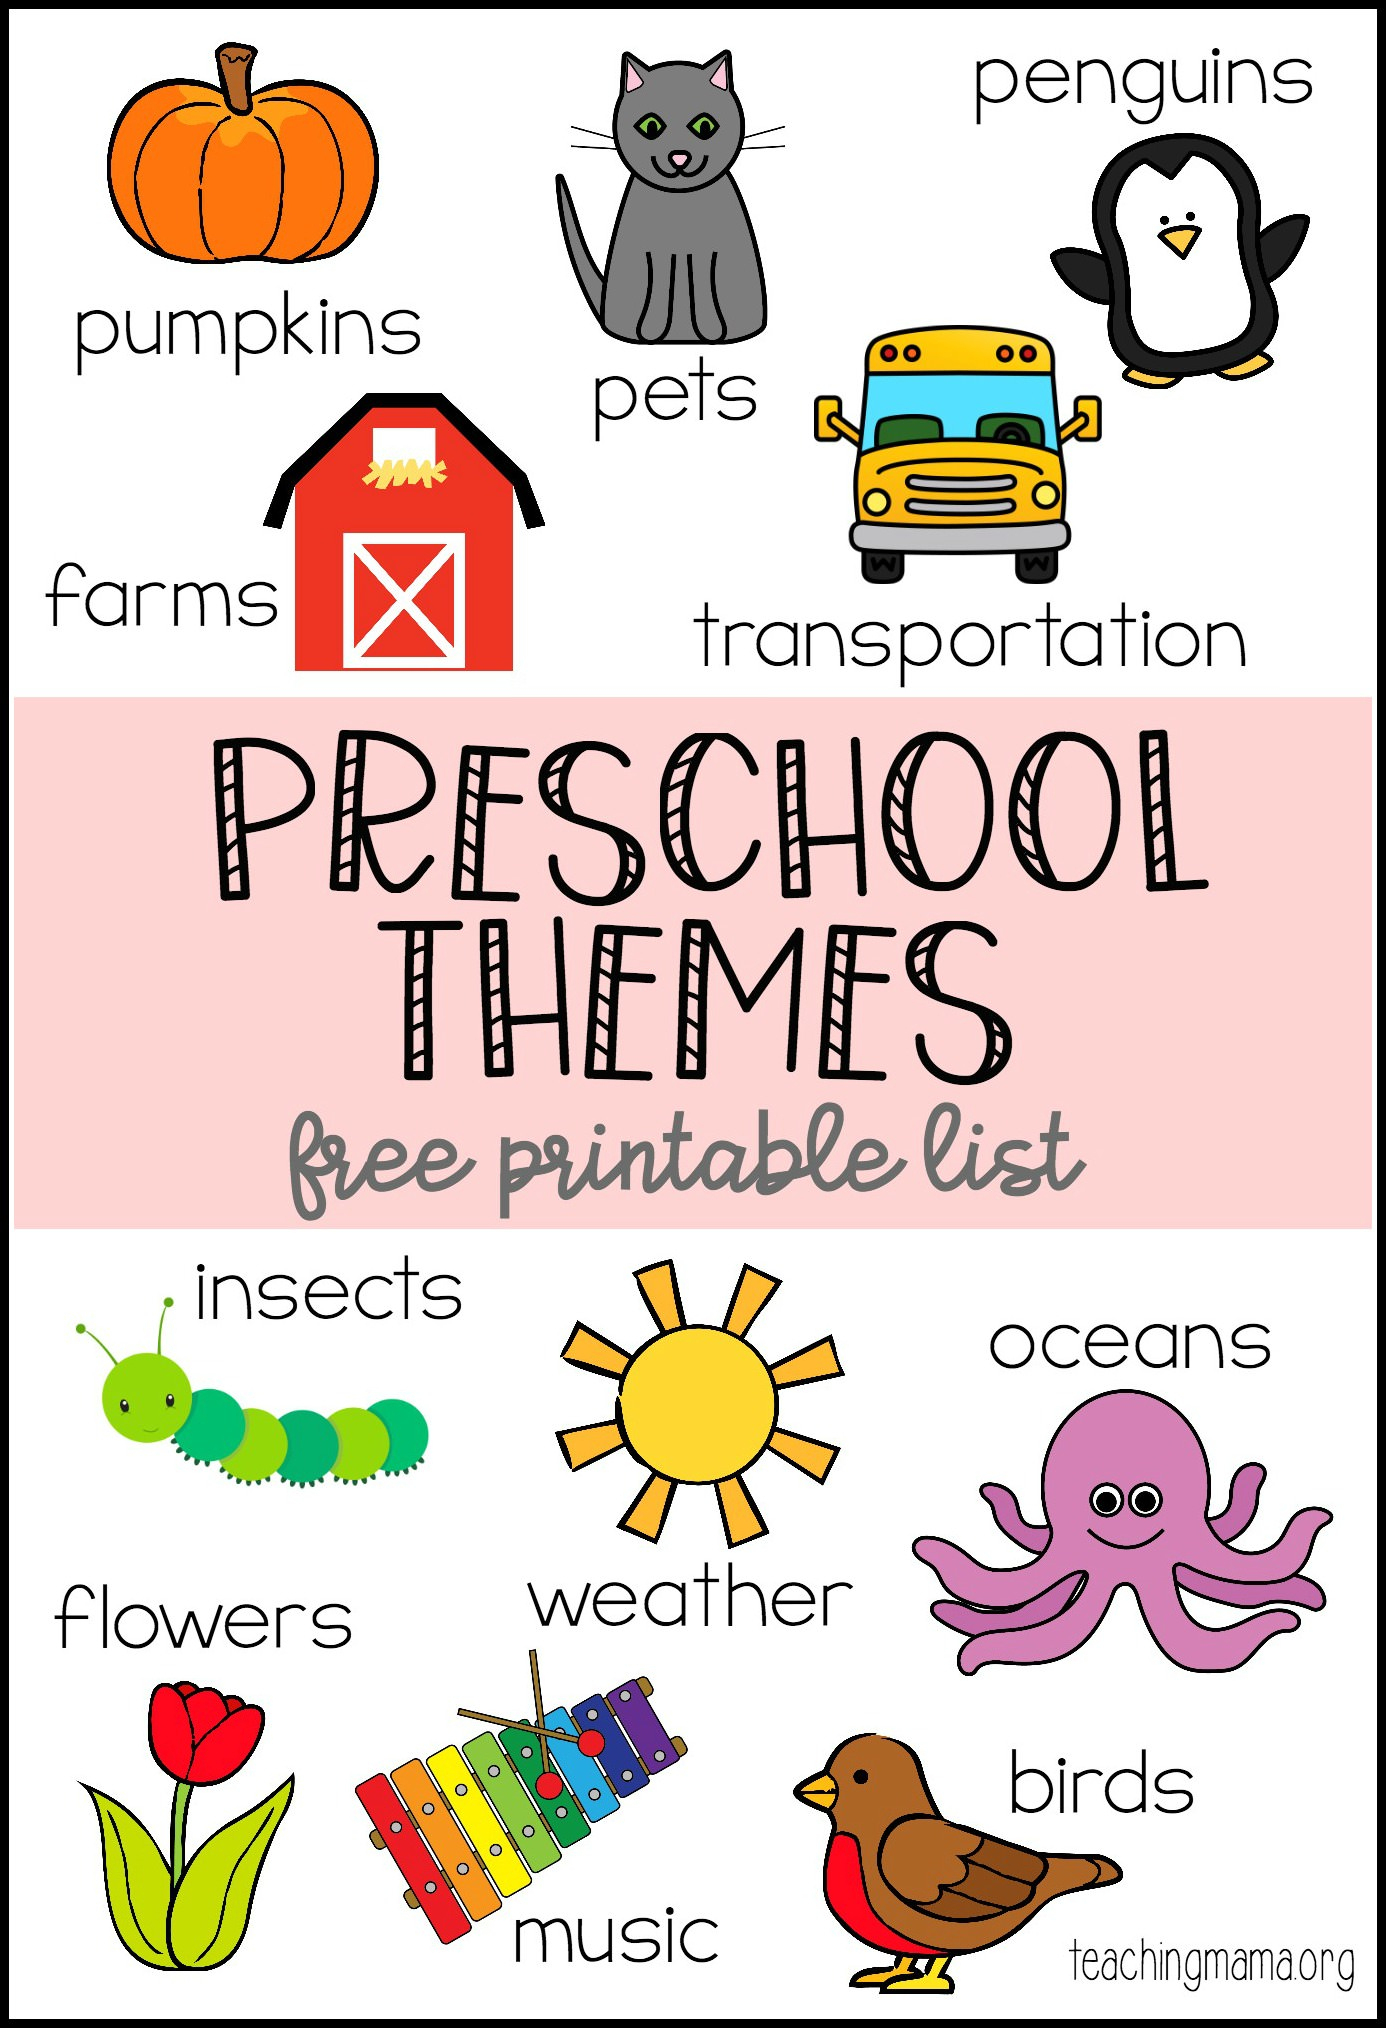 Preschool Themes Printable - Free Printable Picture Schedule For Preschool